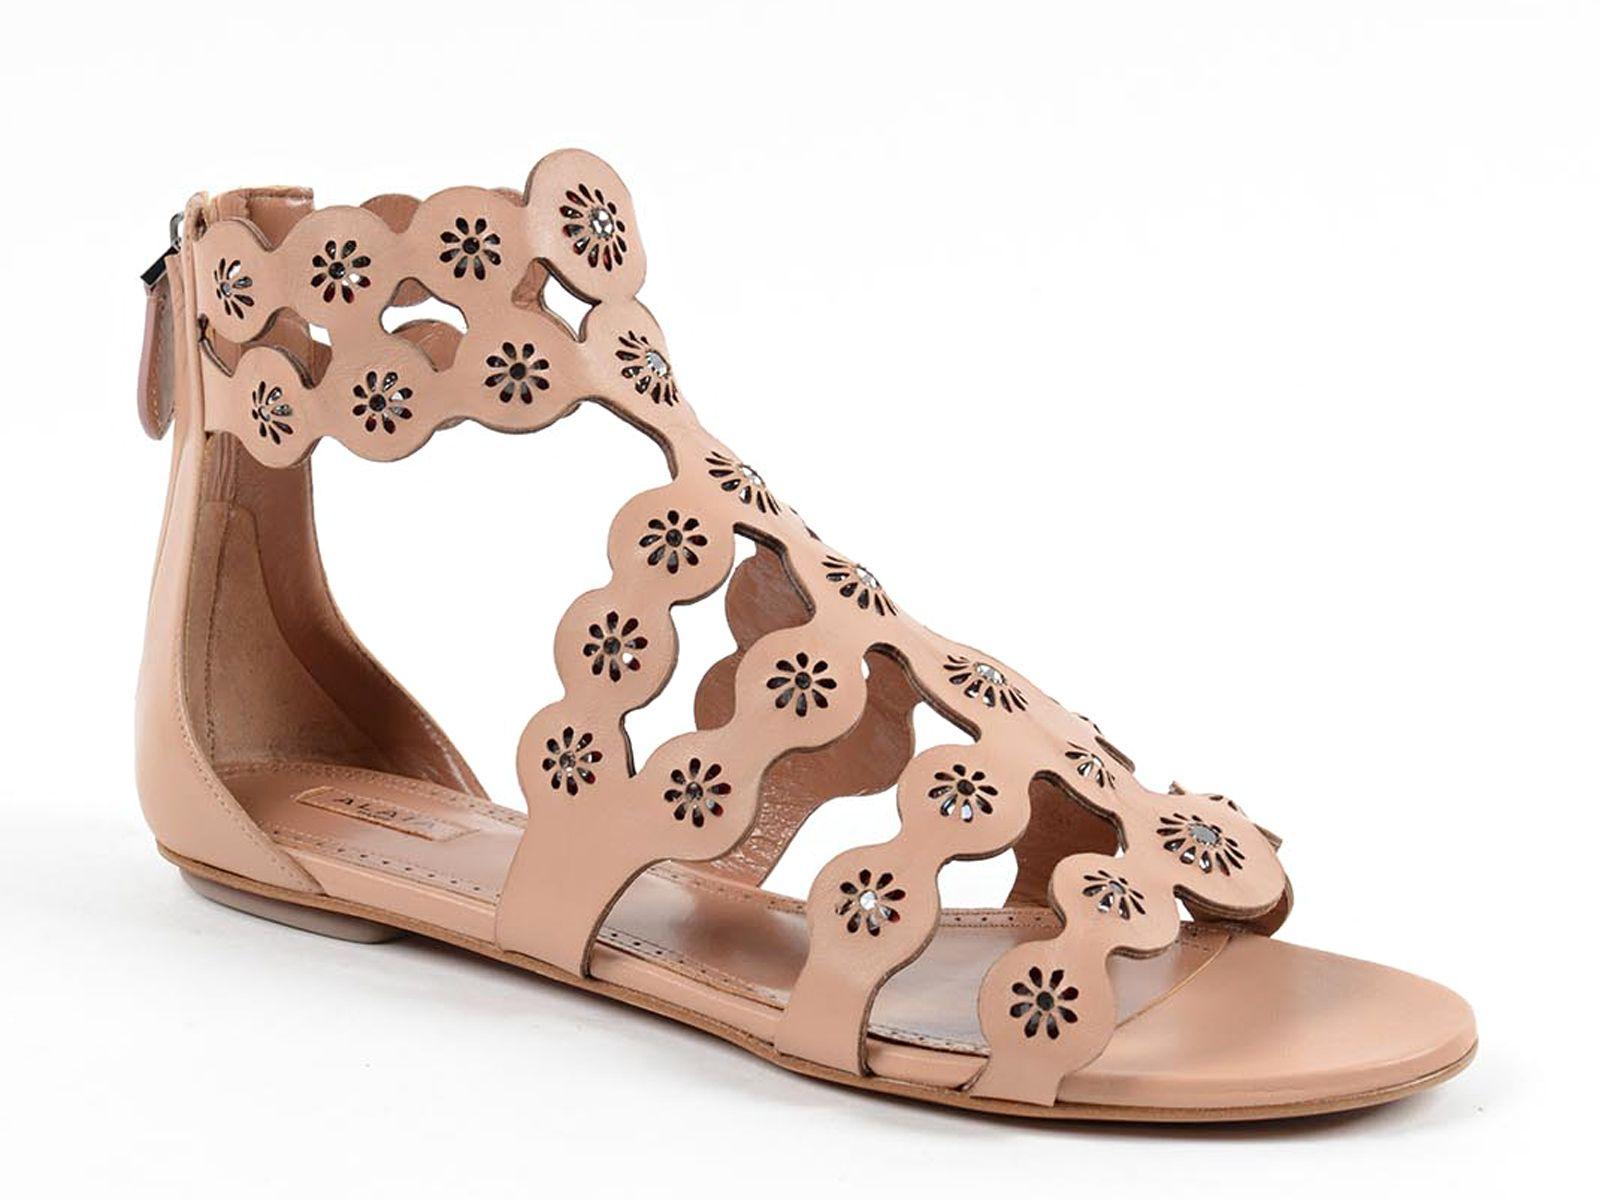 85f13854b4ed Alaïa flats sandals in Nude Leather